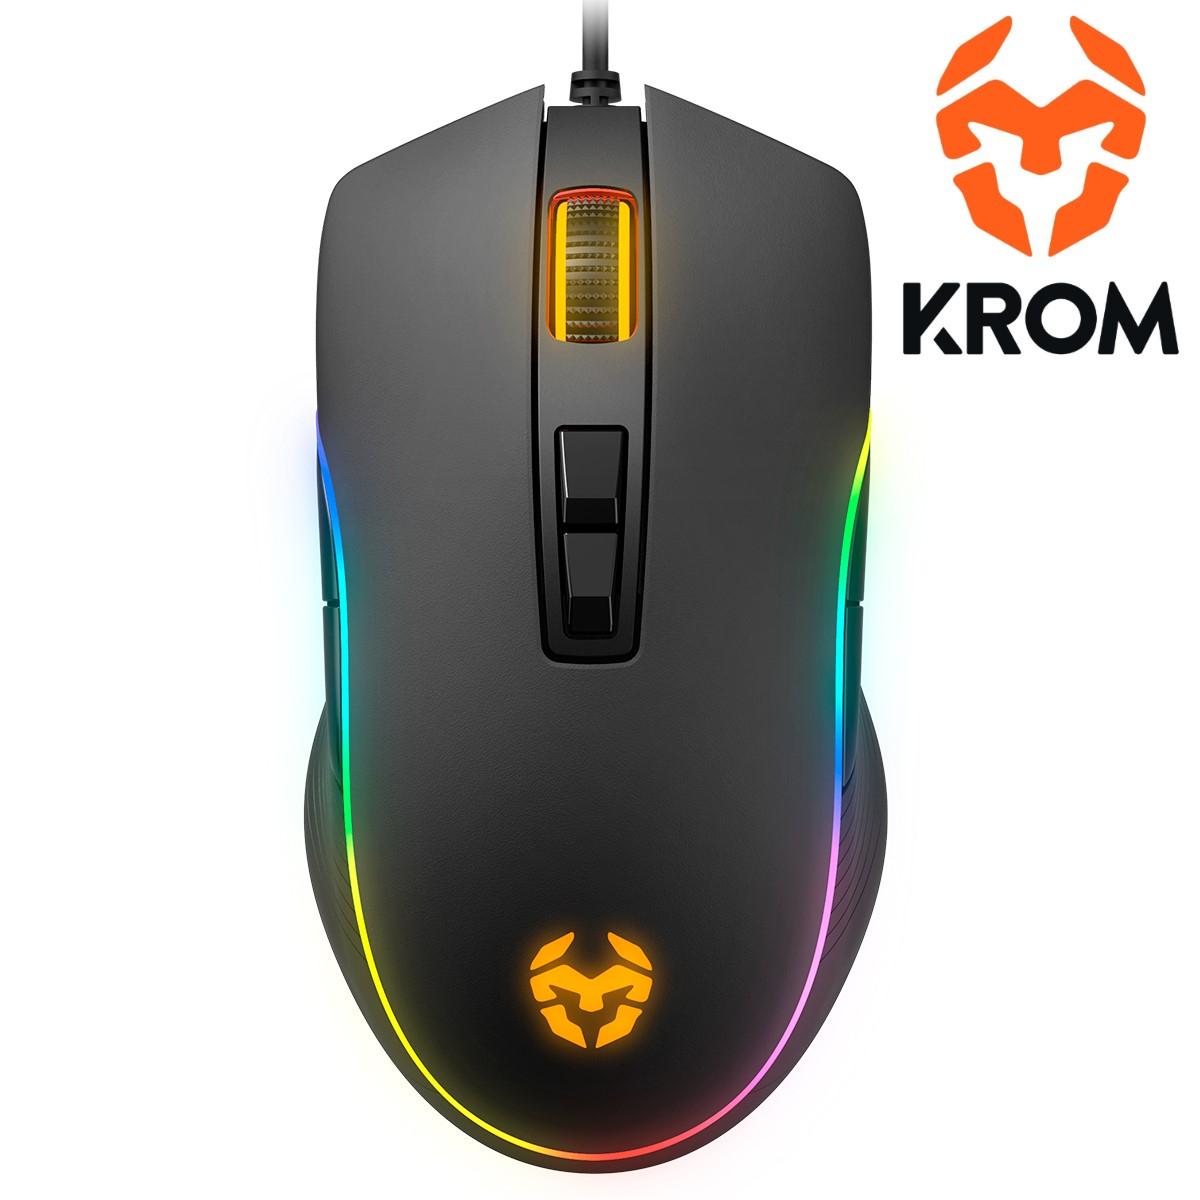 Raton Krom Kane Gaming Usb Optico 4000 Dpi Ambidiestro